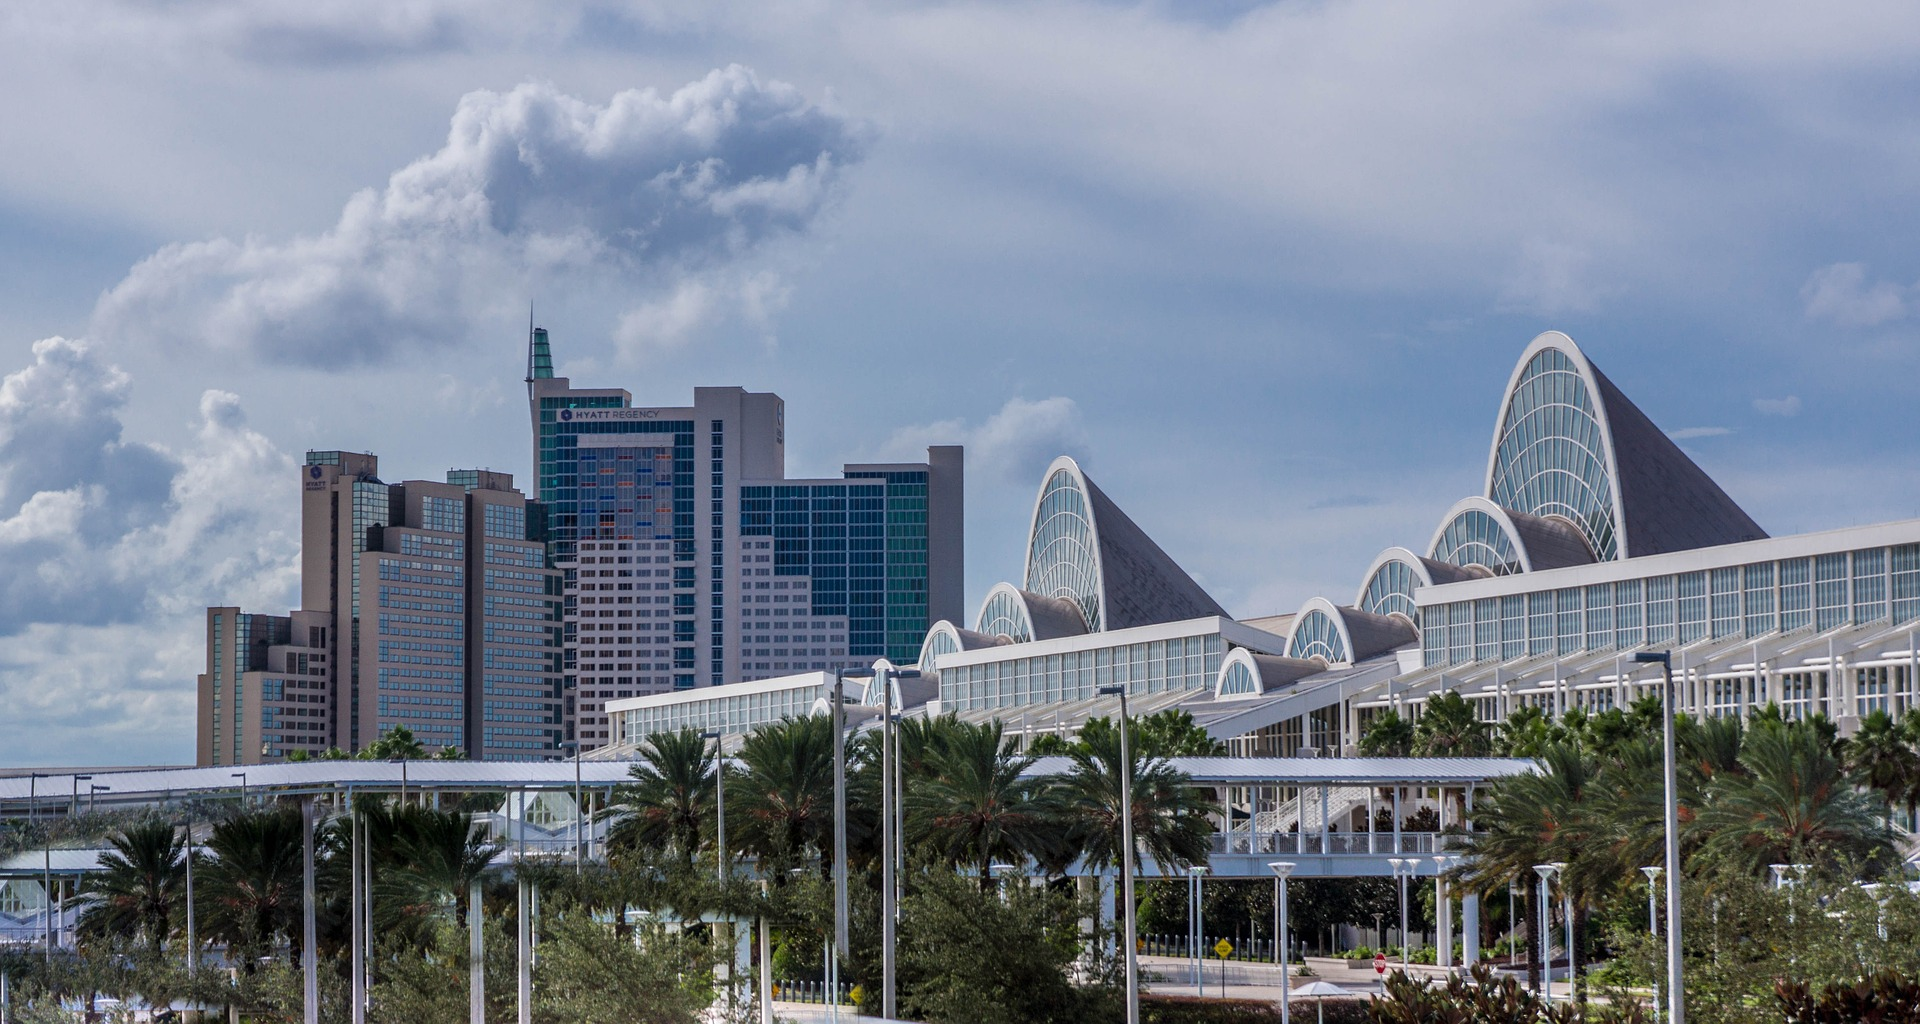 NAFEM 2019 Recap Our Biggest Takeaways from Orlando